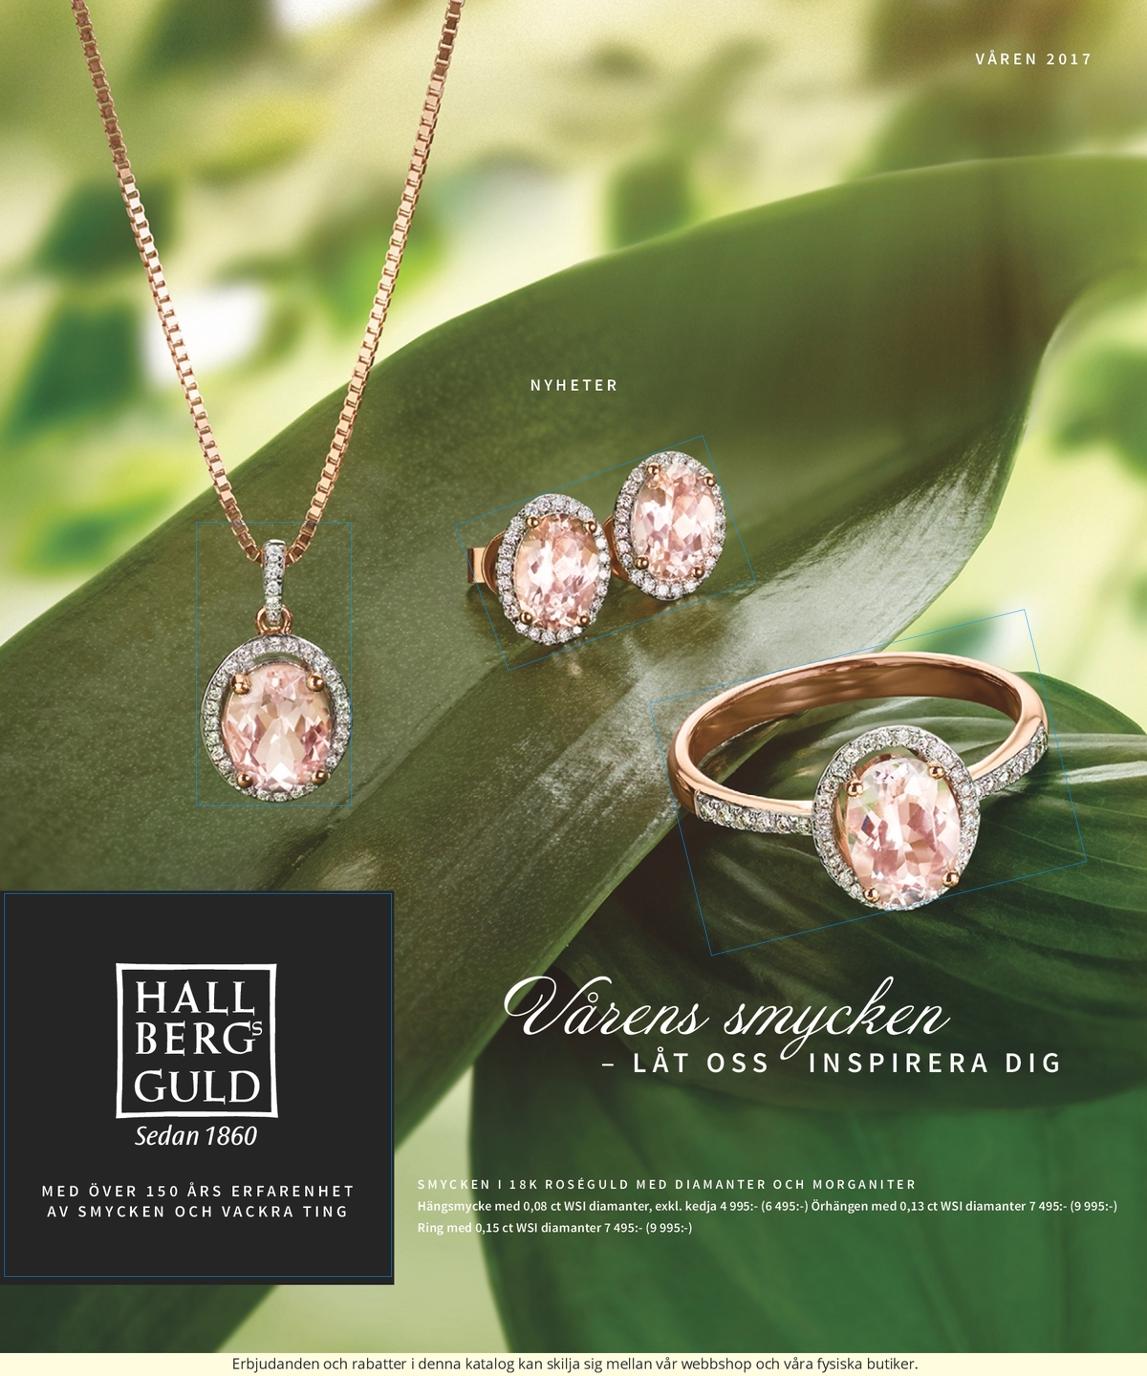 Hallbergs Guld Våren 2017 db3682191493c